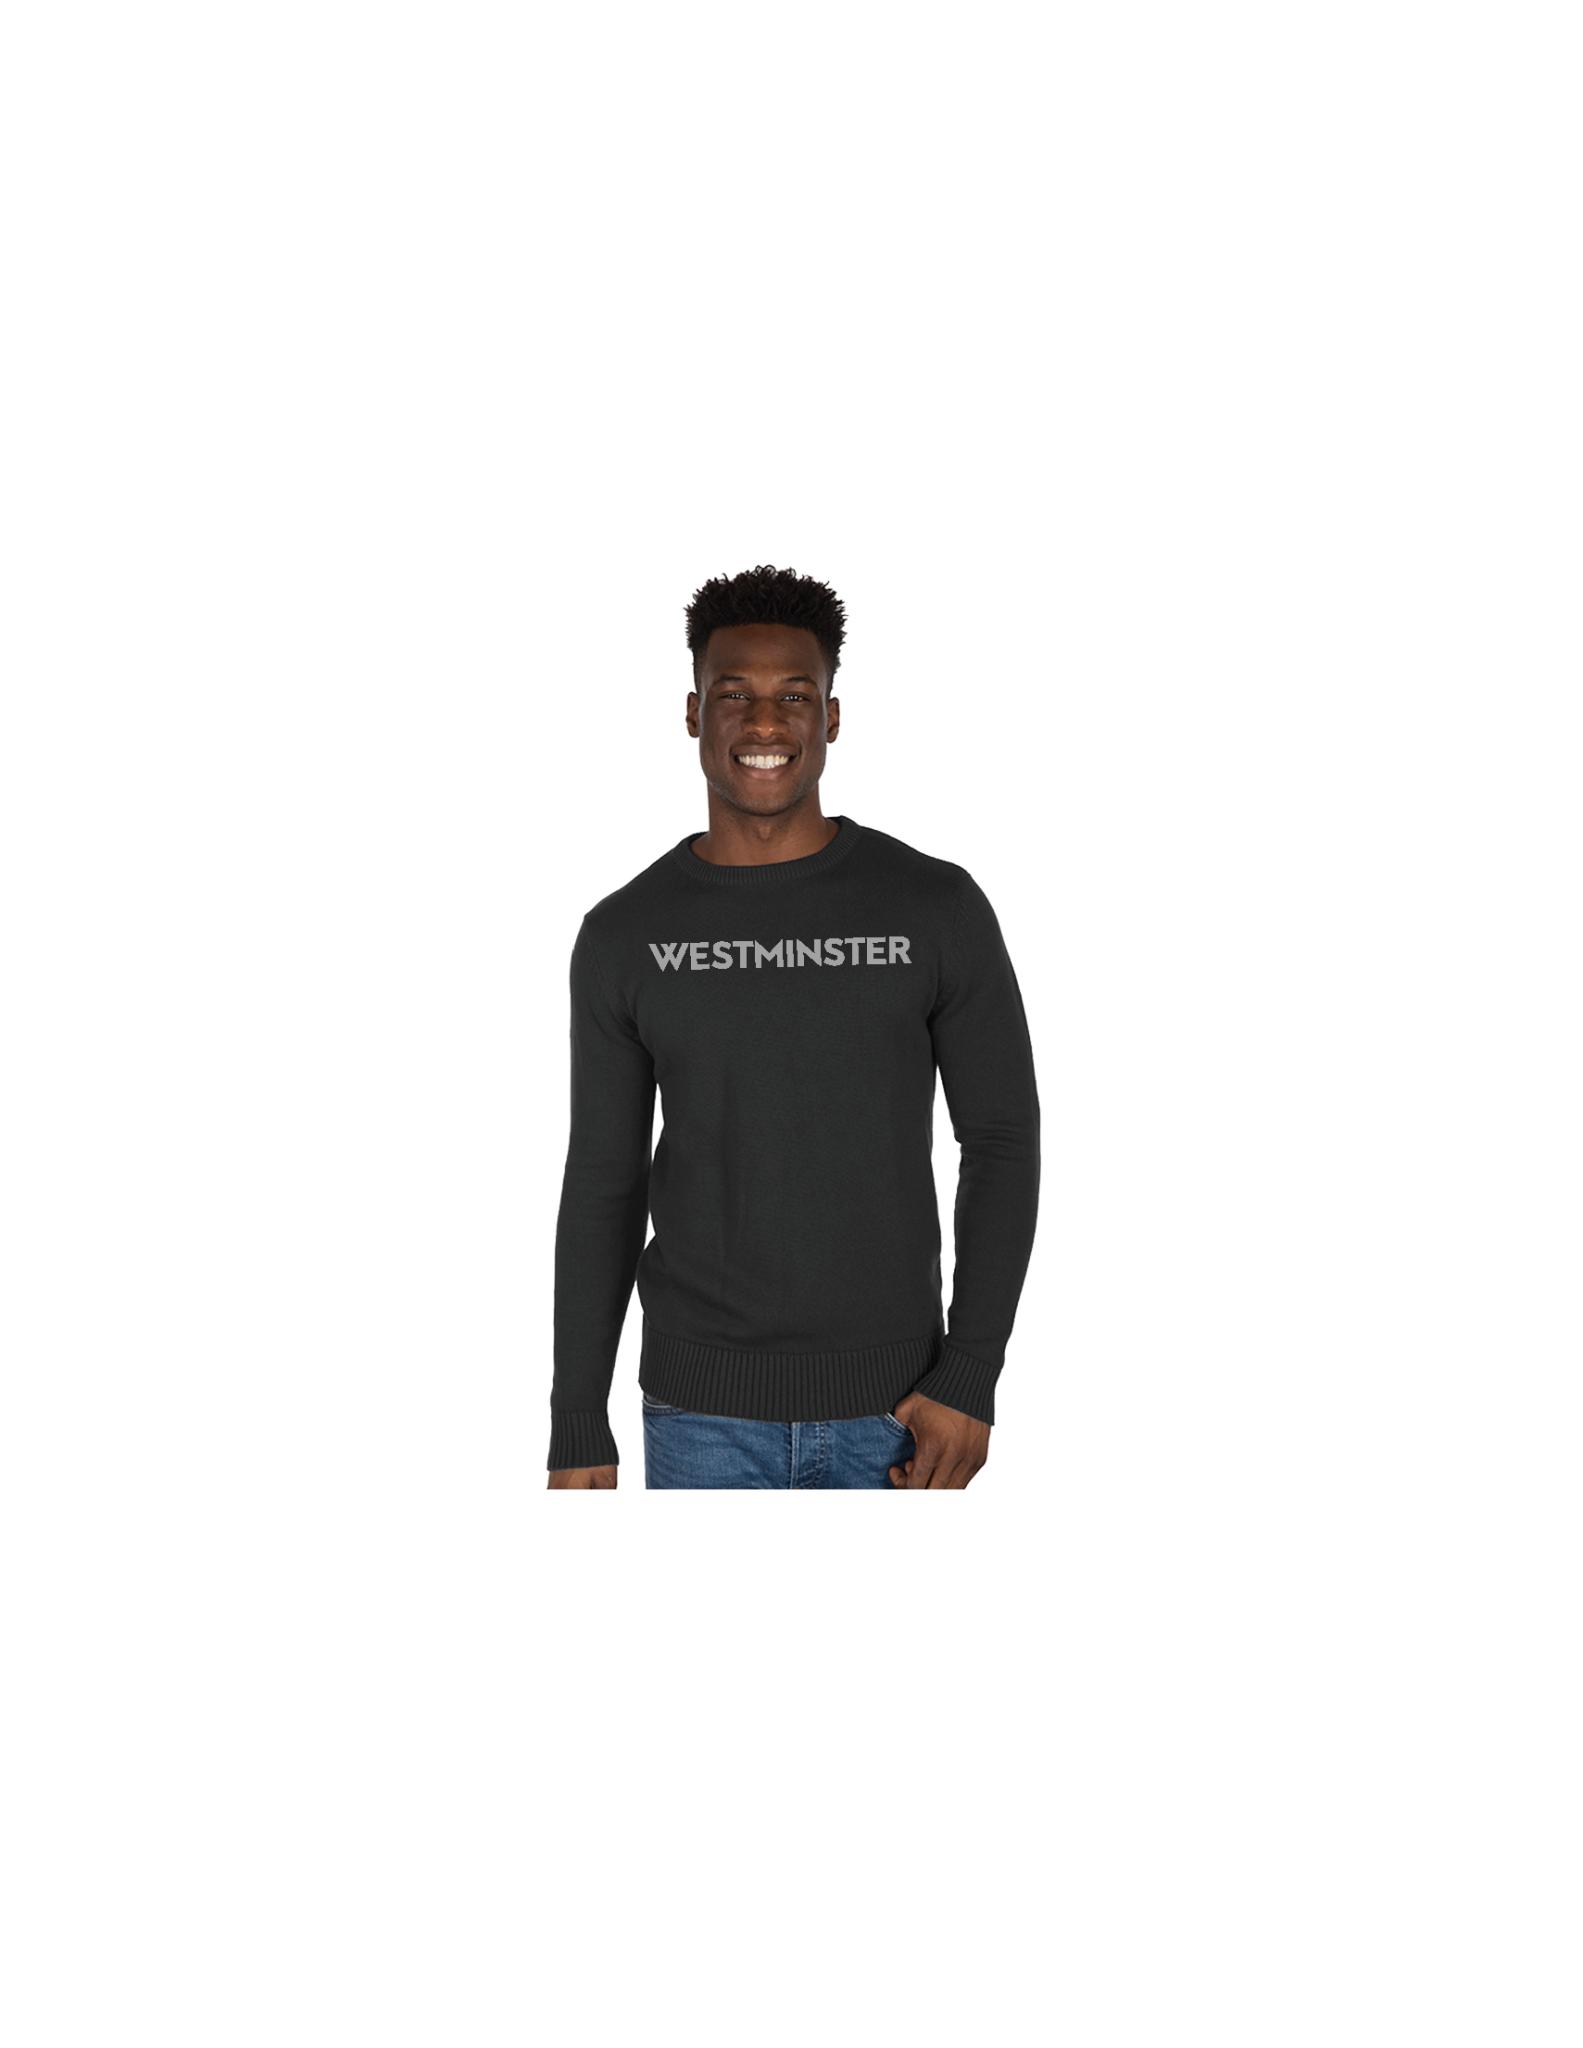 Sweater: Crew Neck, Granite and Stone